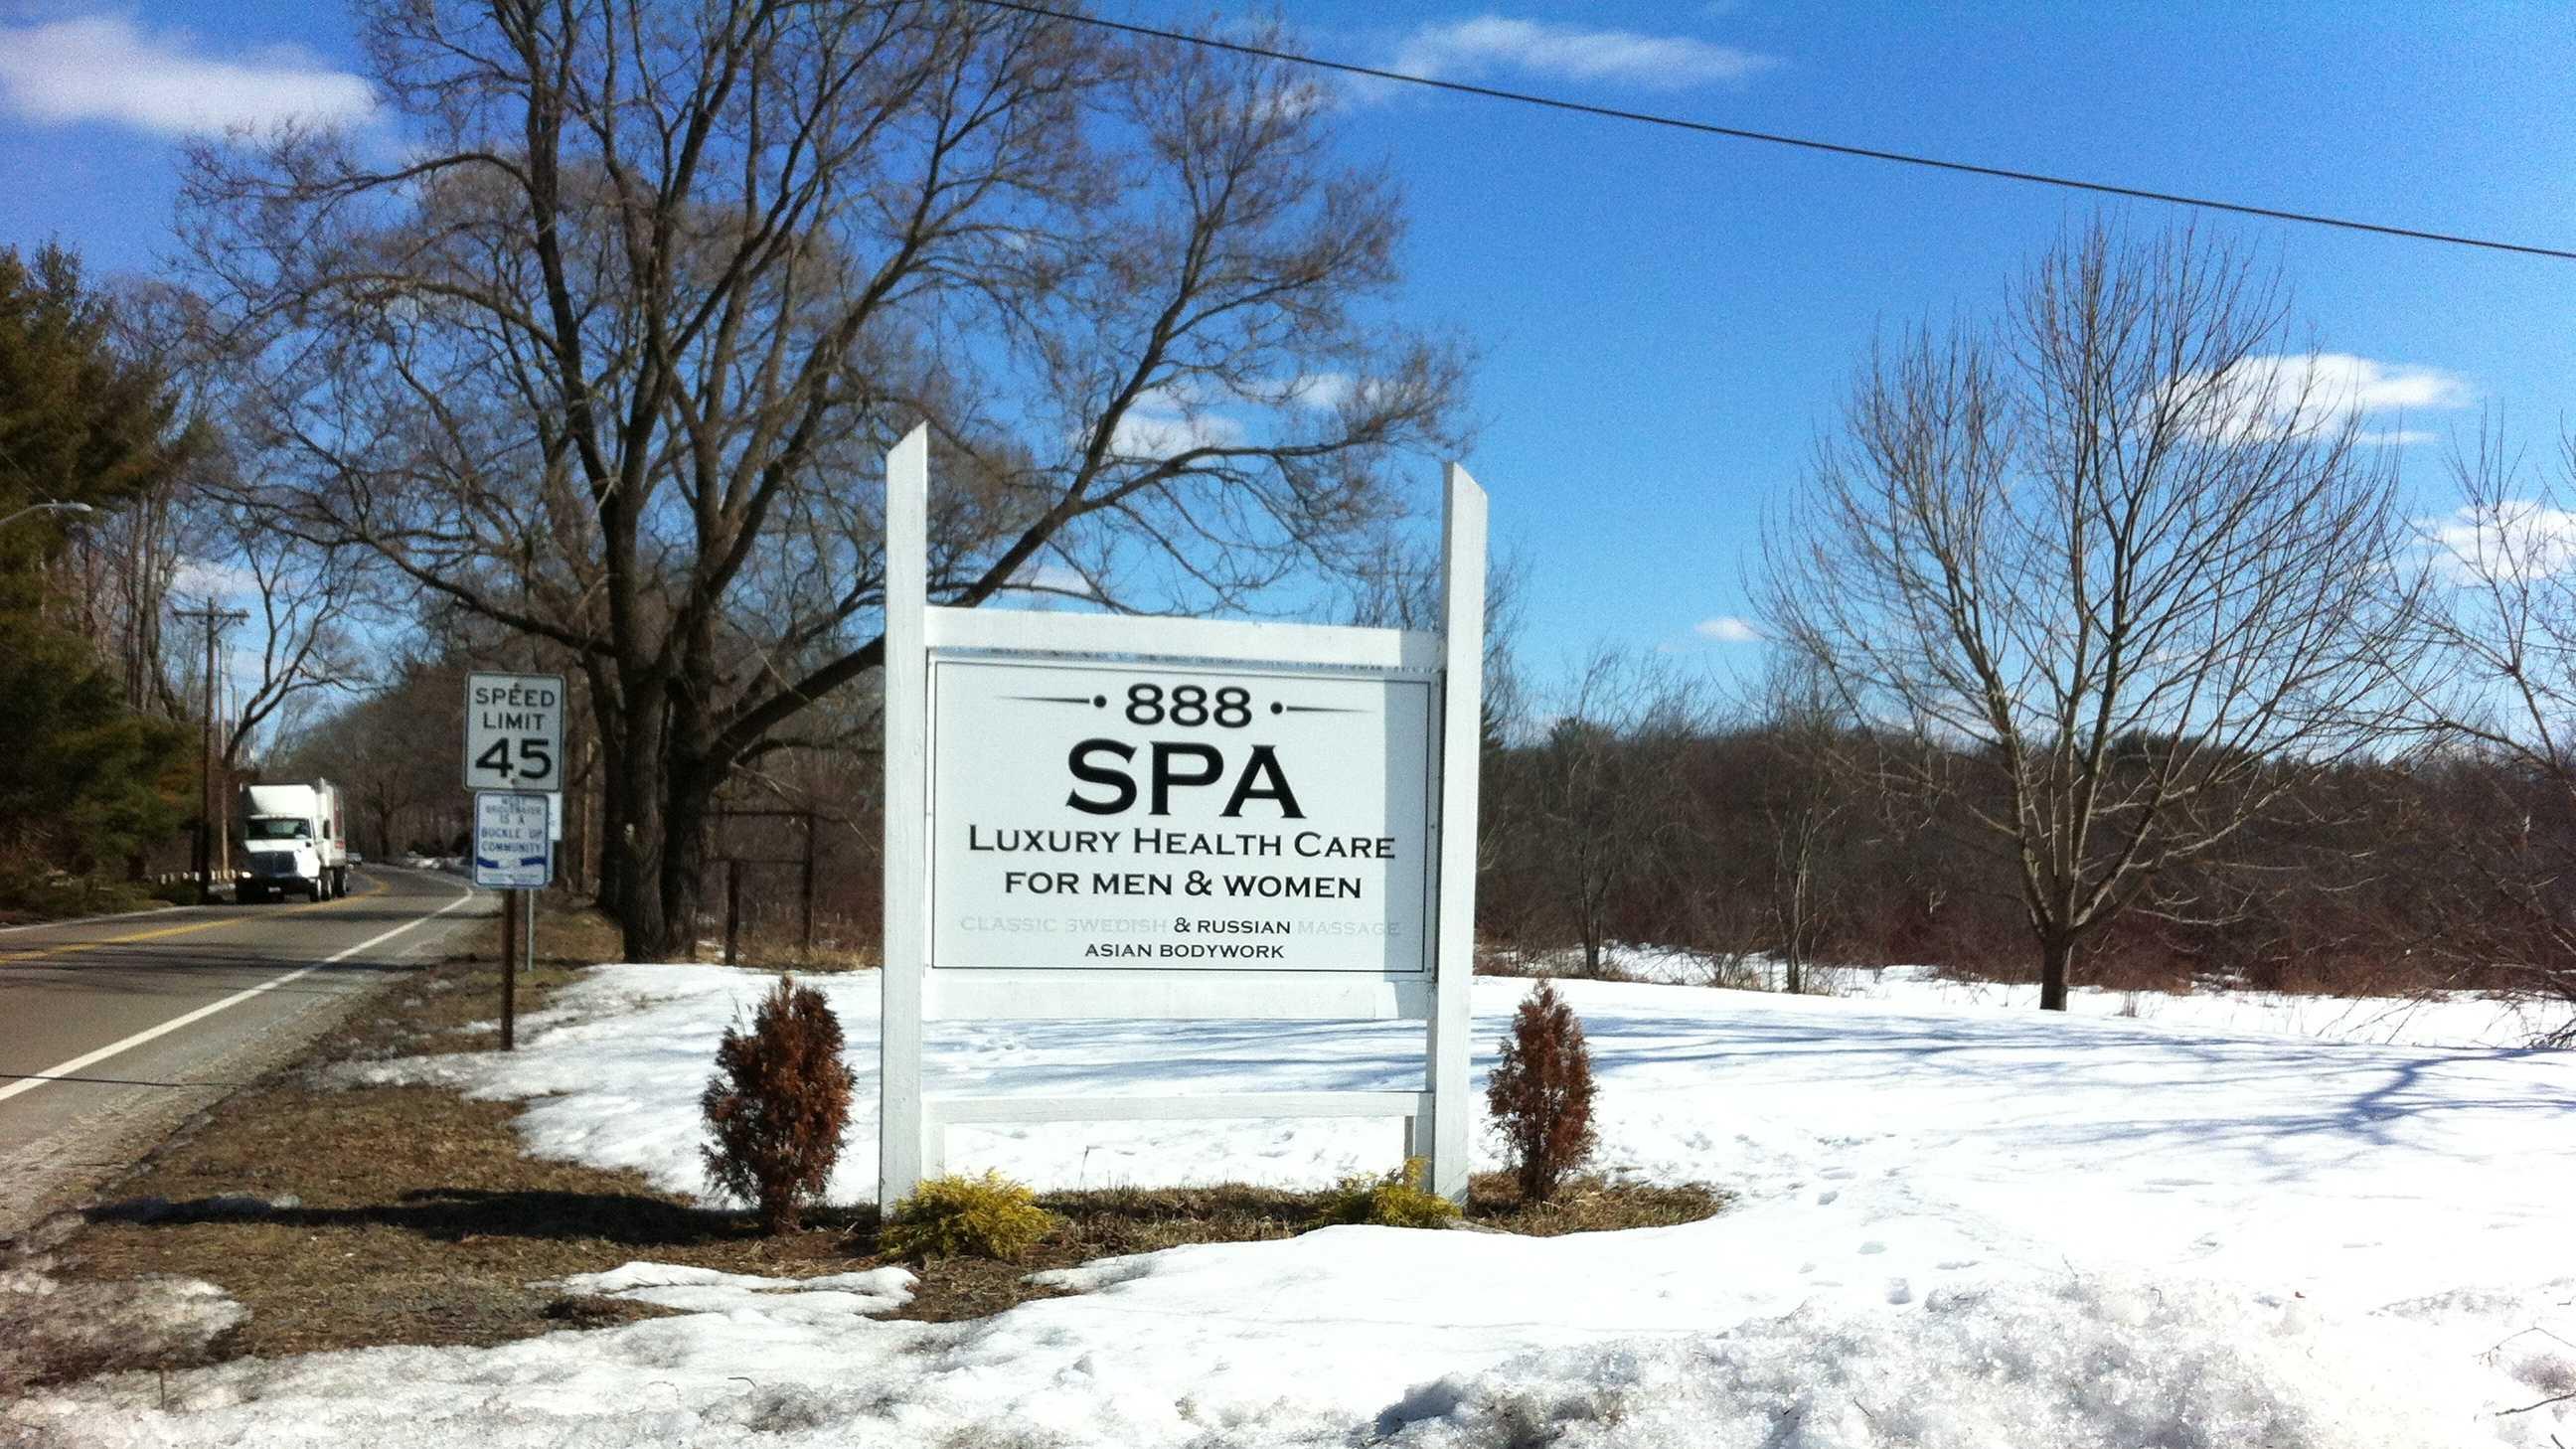 west bridgewater spa closes